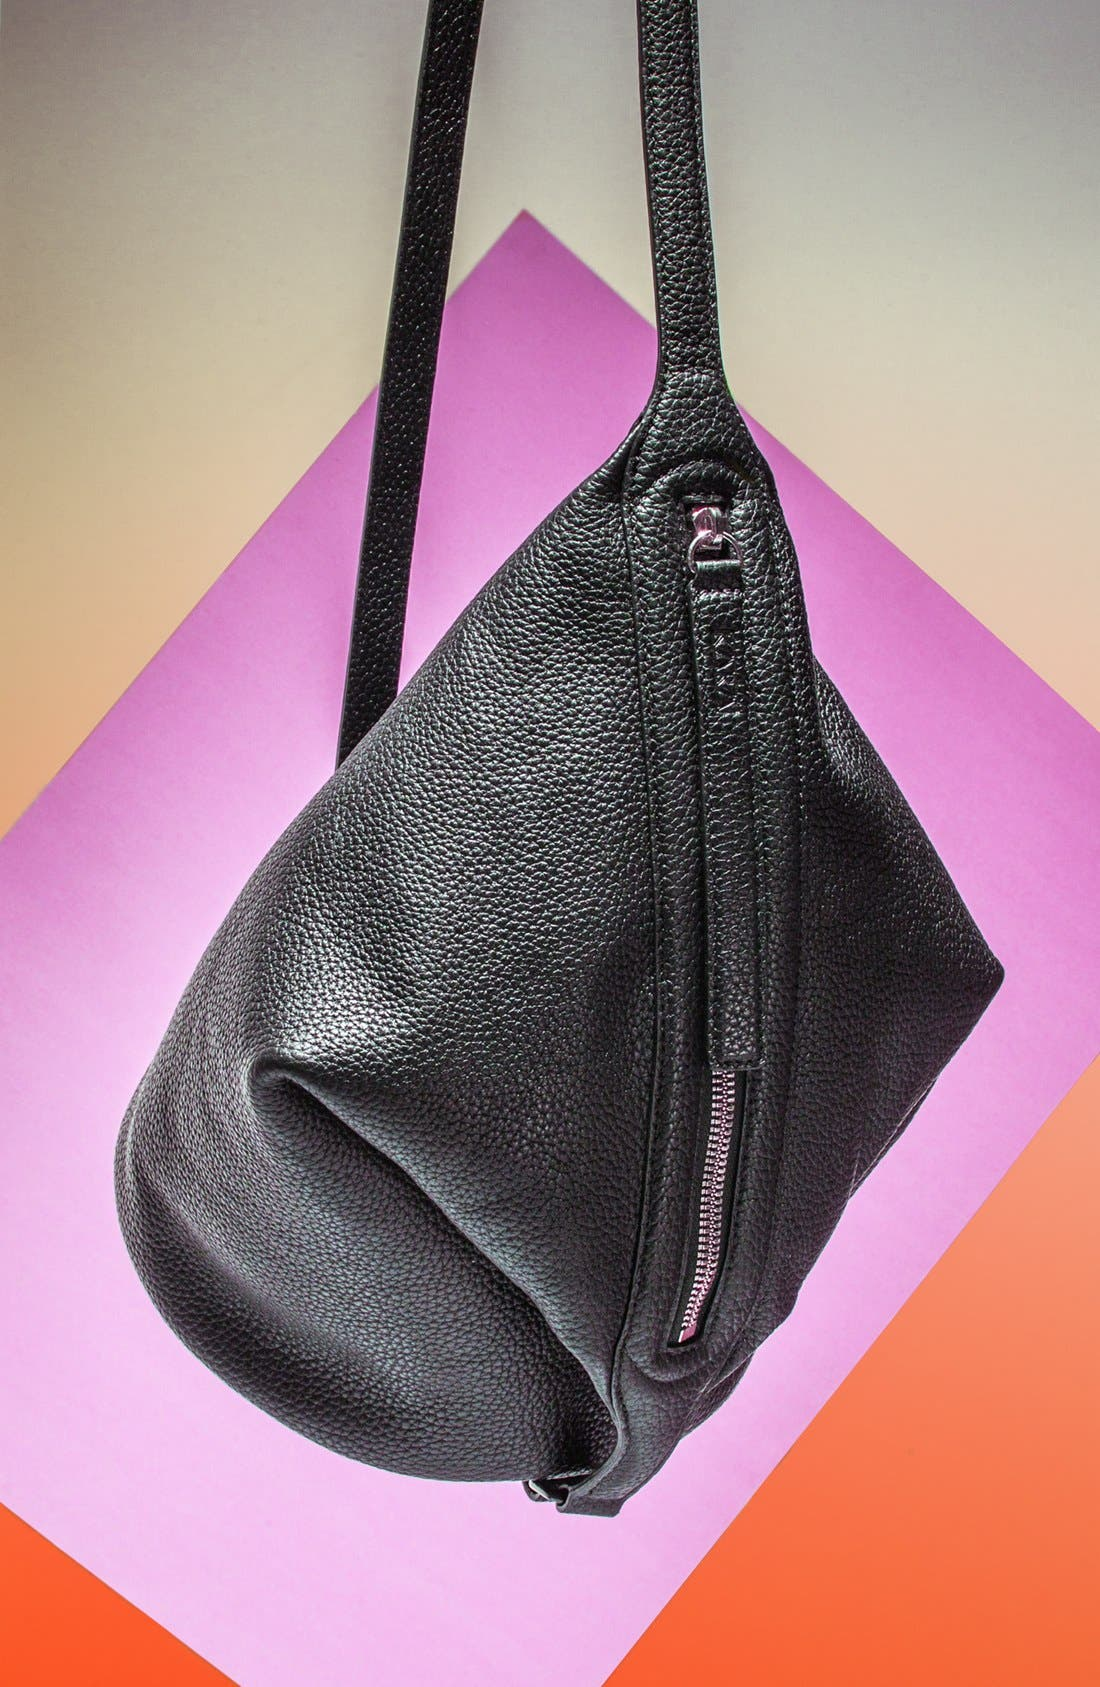 Alternate Image 1 Selected - Kara 'Dry - Small' Convertible Pebbled Leather Bucket Bag, Small